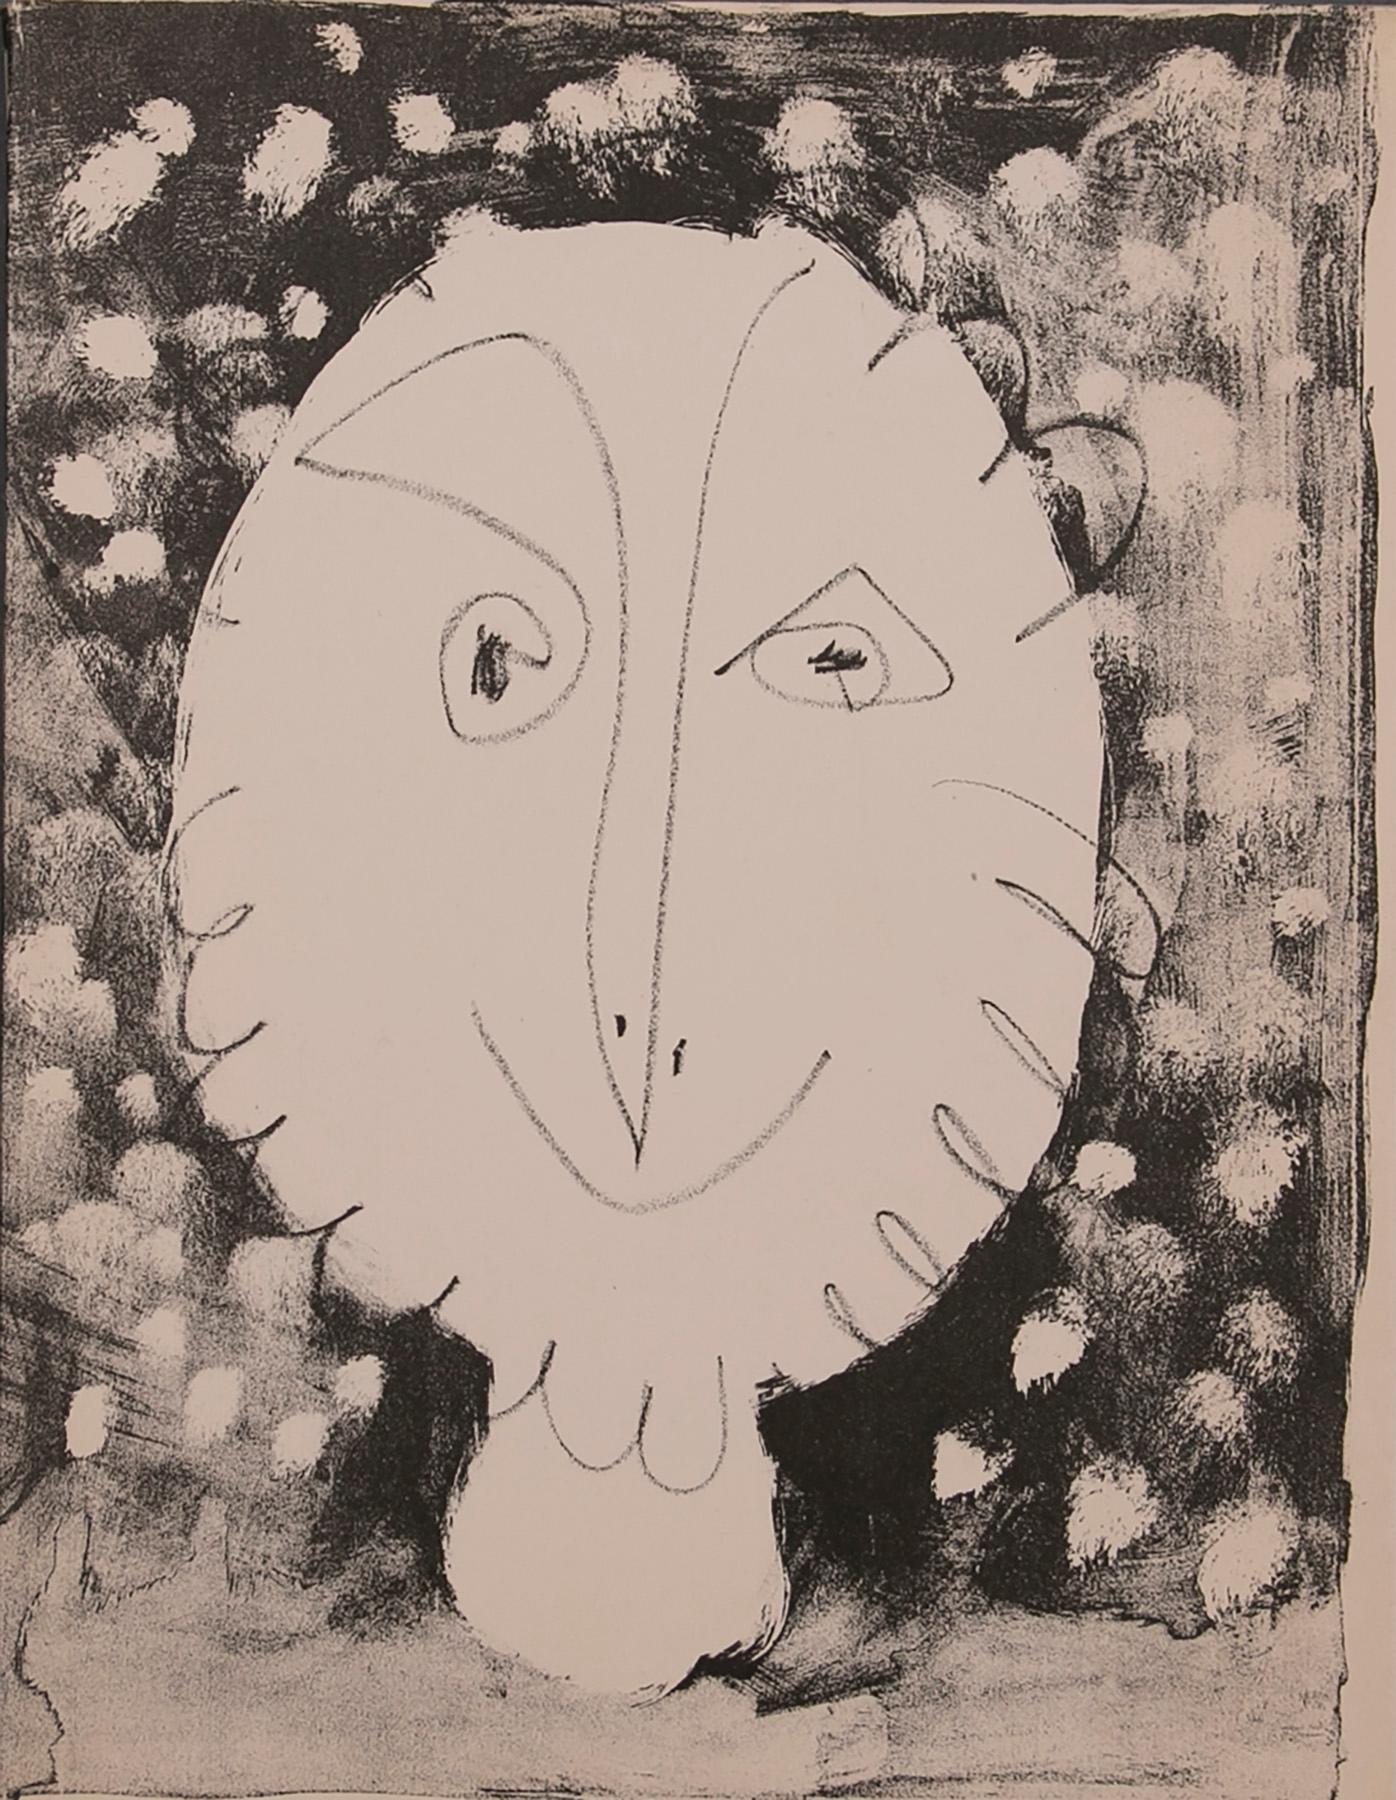 Deux Tetes, I - Lithograph by Pablo Picasso 1949